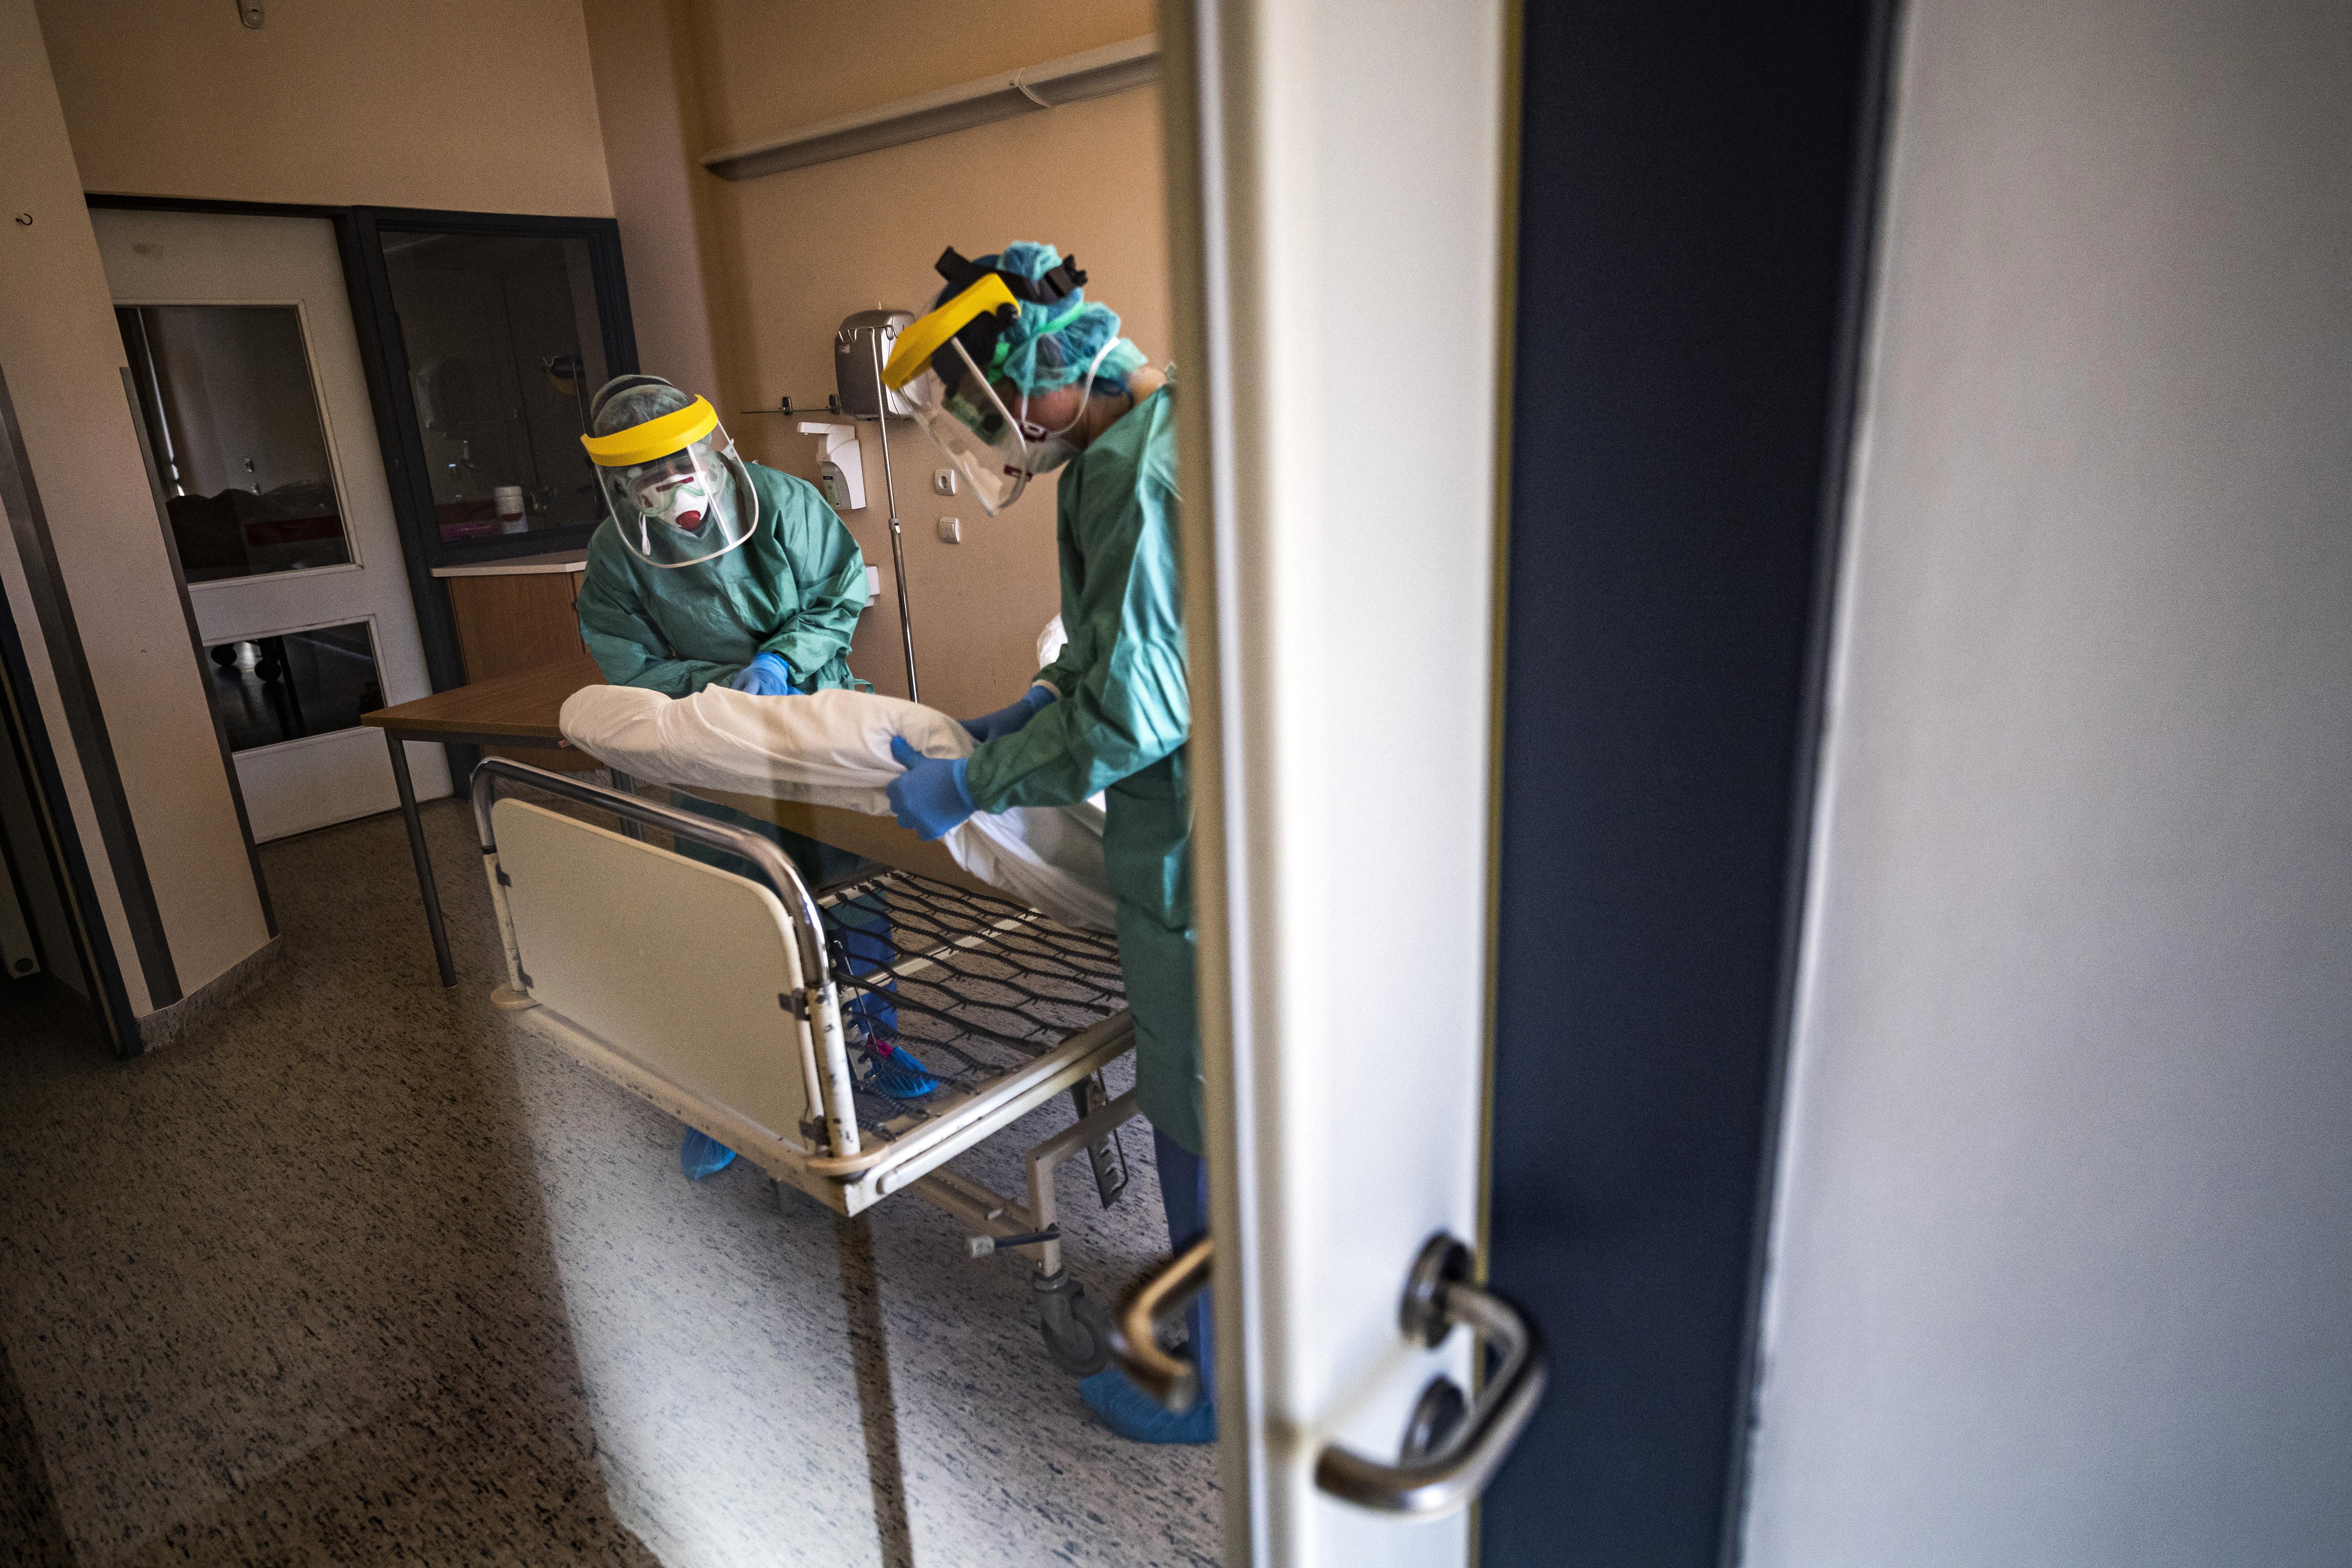 Sechsjähriges Mädchen verlor beide Elternteile wegen dem Coronavirus